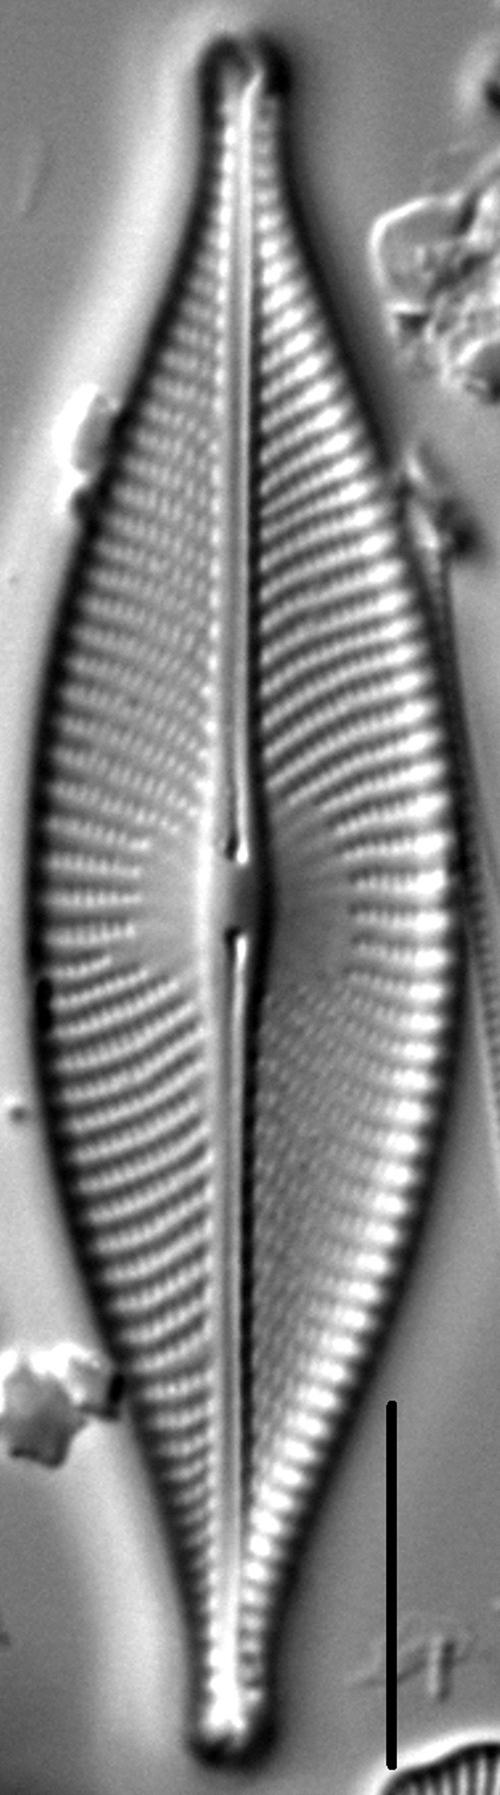 Navicula whitefishensis LM2